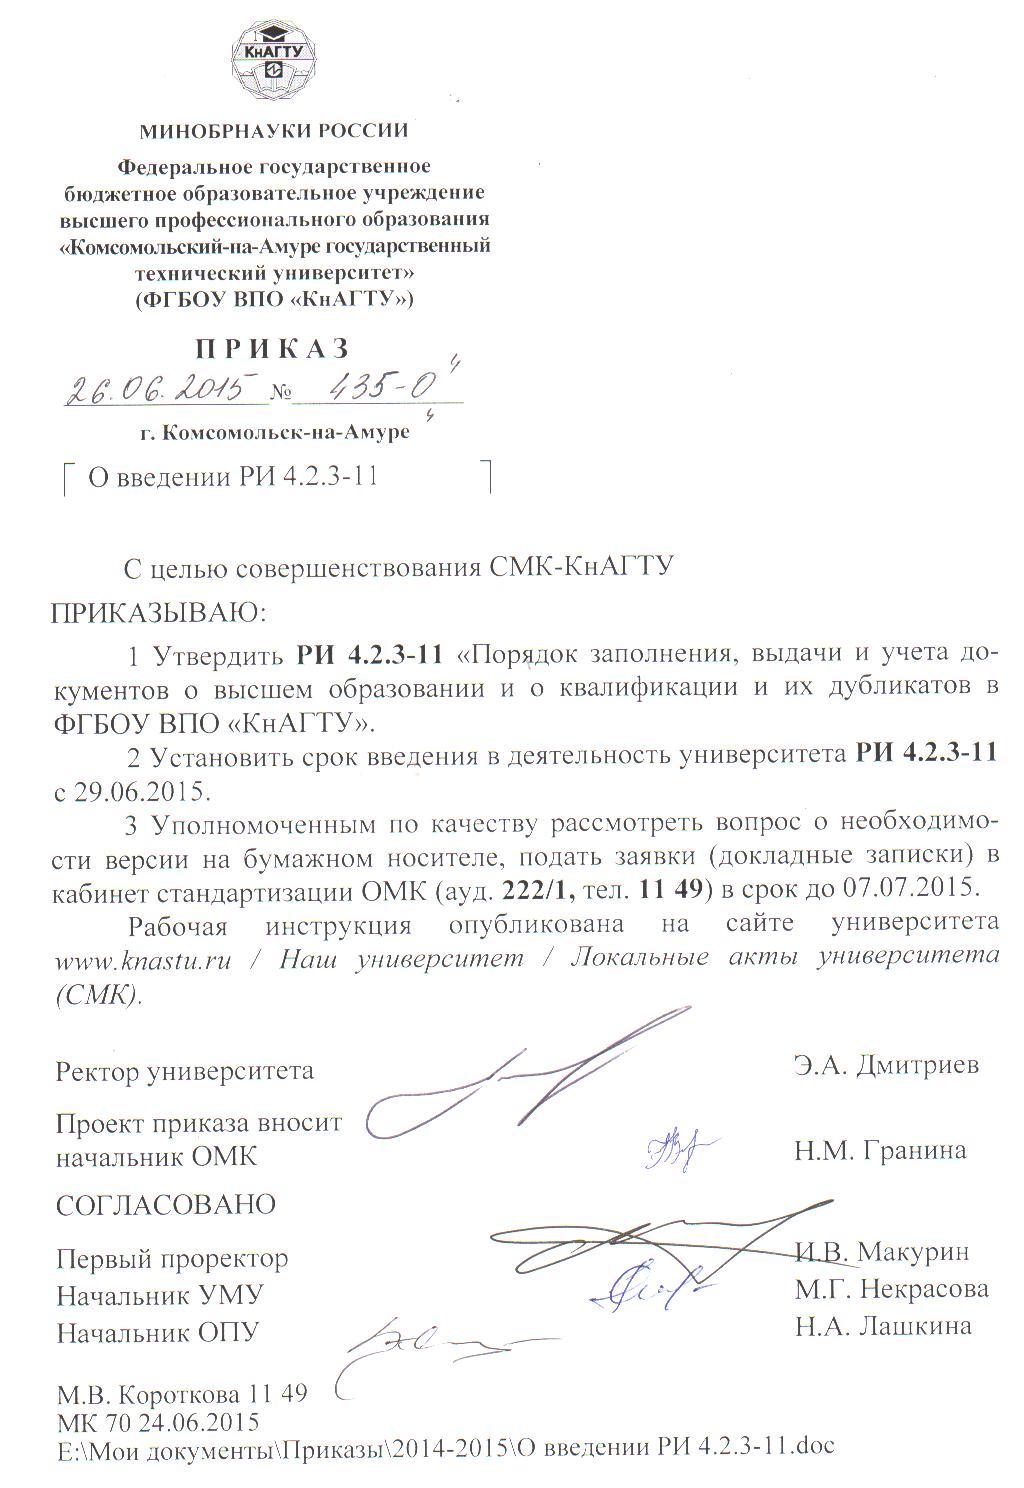 КнАГУ Нормативные документы  Приказ № 435 О от 26 06 2015